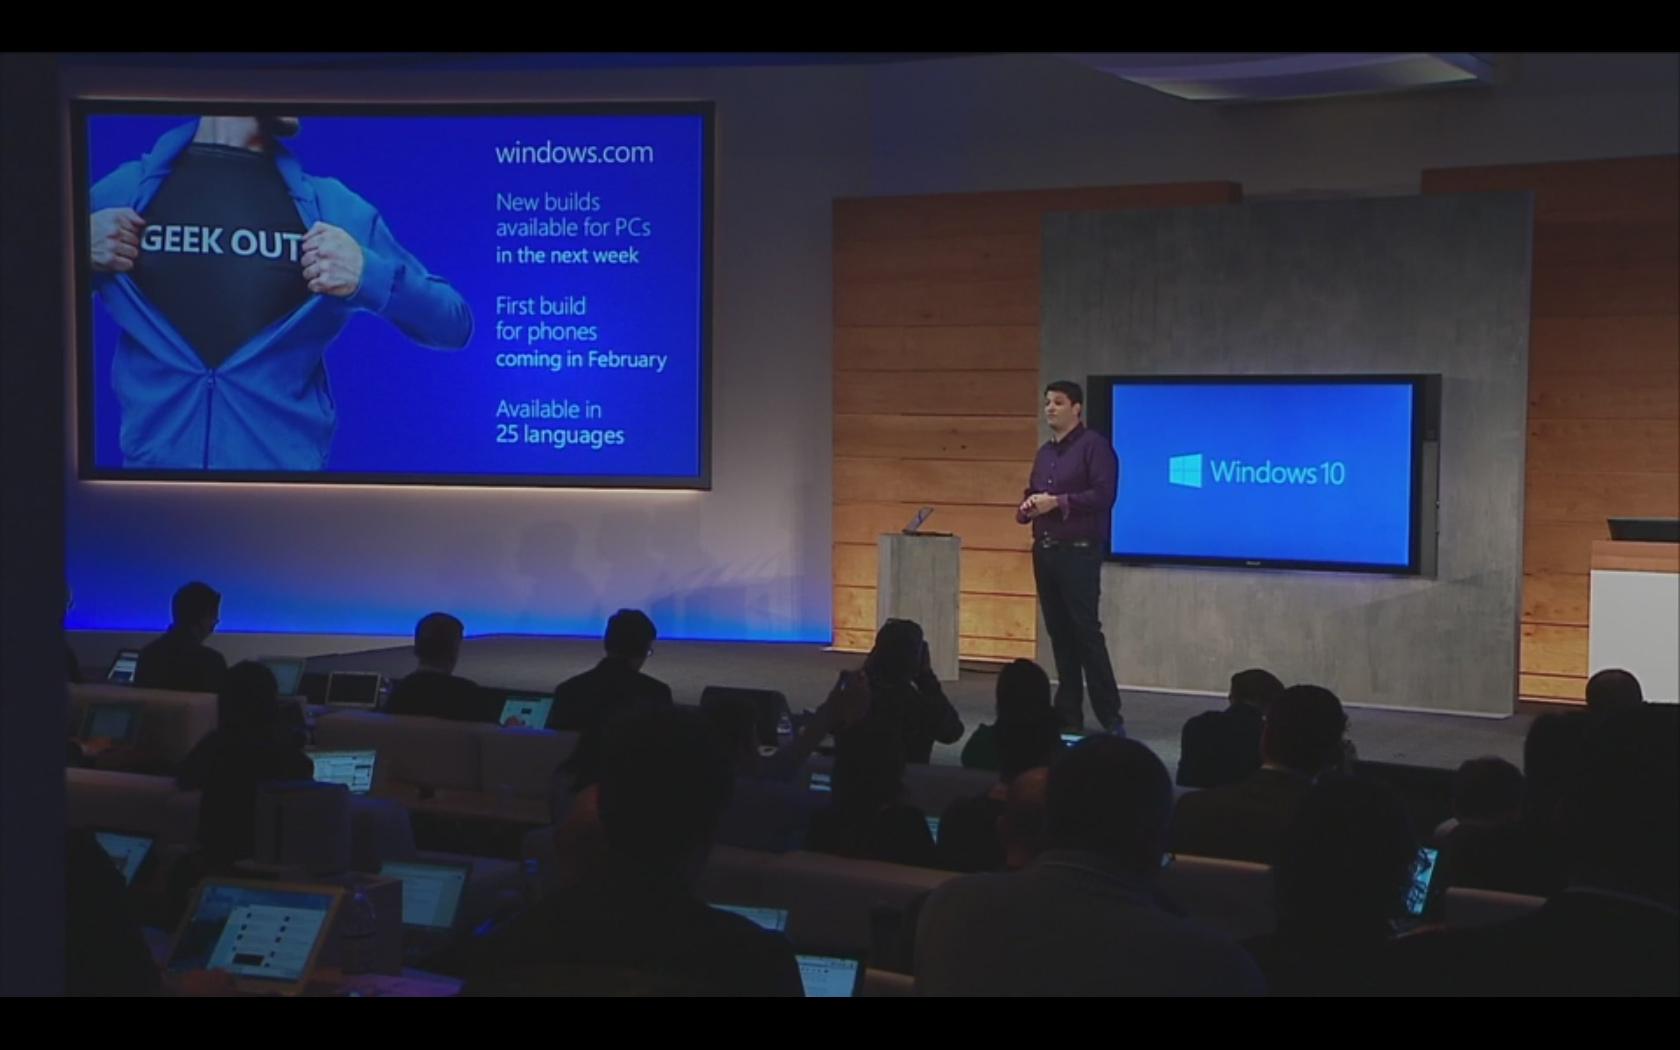 microsoft-windows10-consumer-keynote-02.jpg